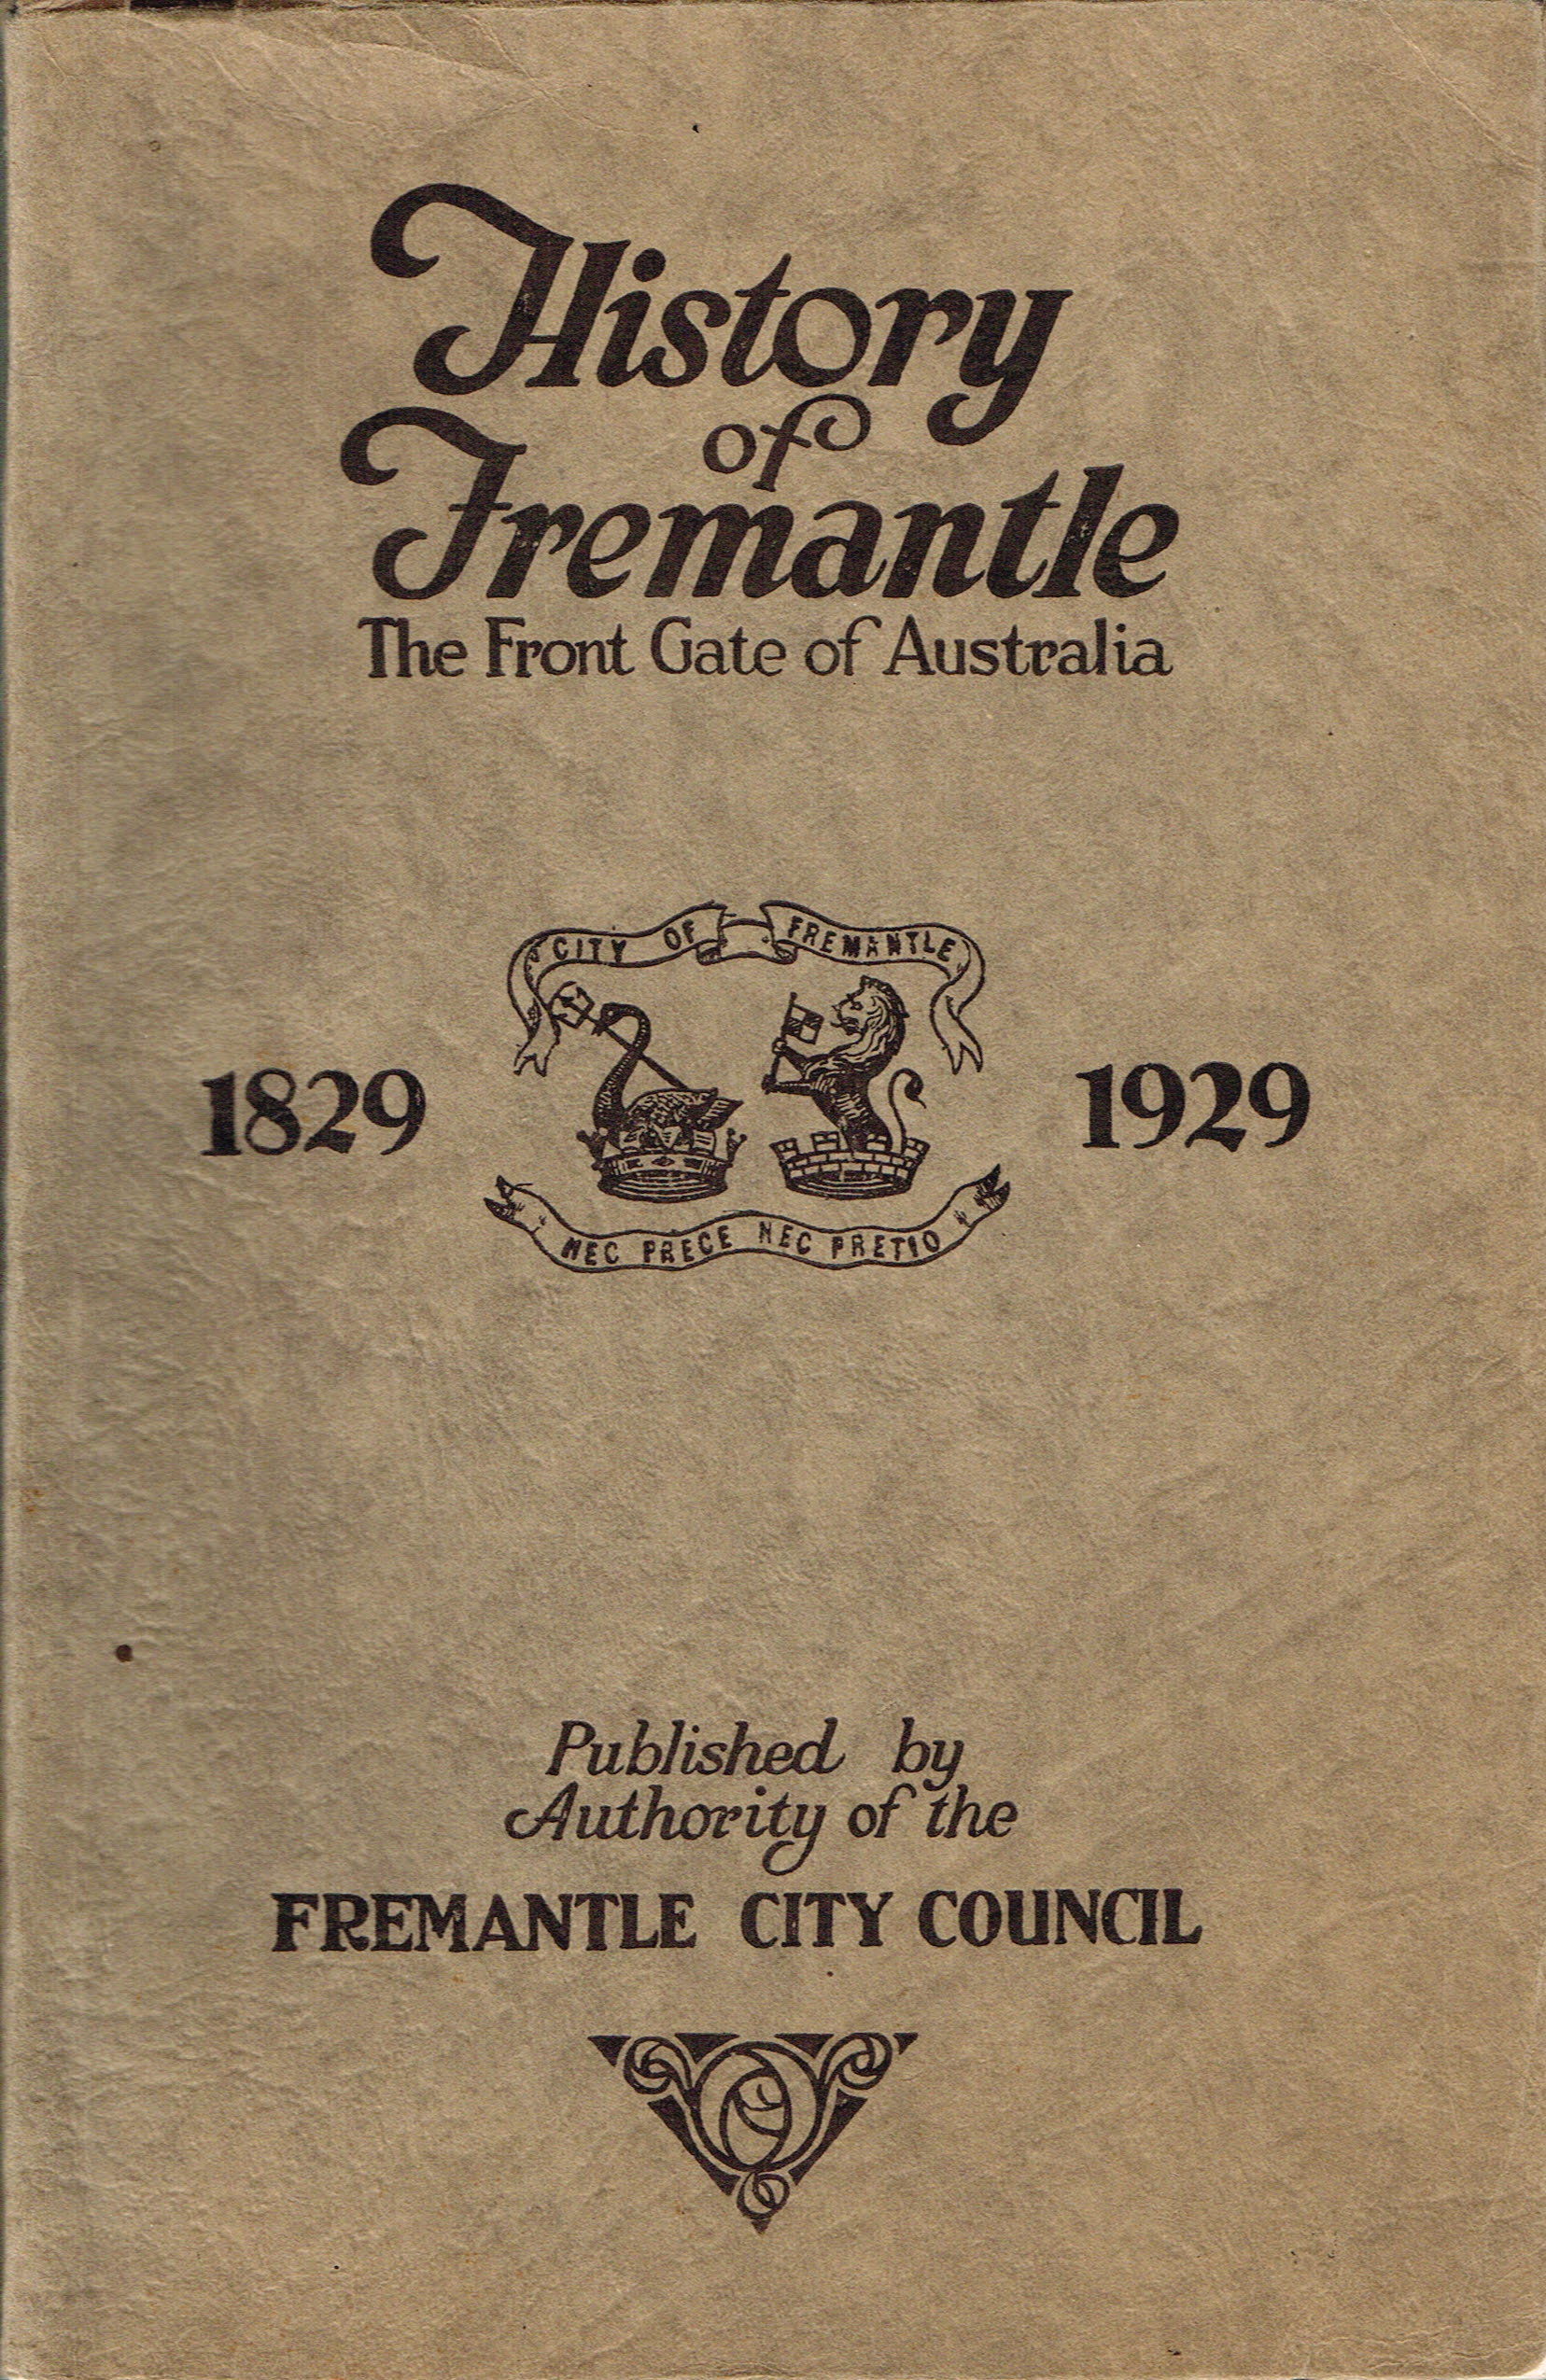 History_of_Fremantle.jpg